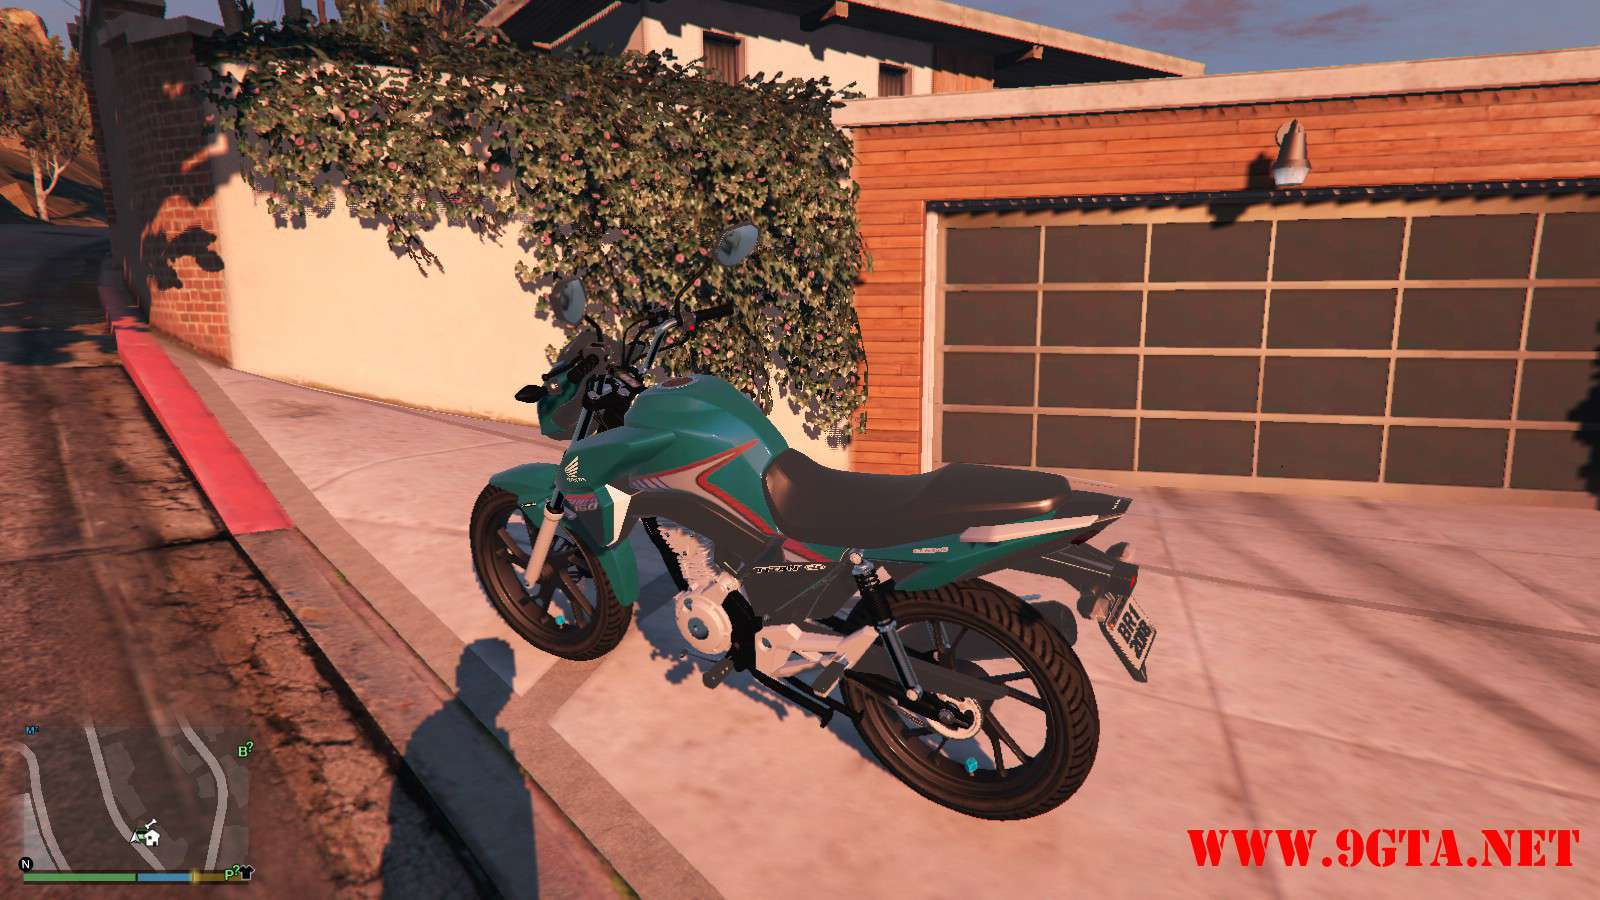 2016 Titan 160 Motocycle GTA5 Mods (7)